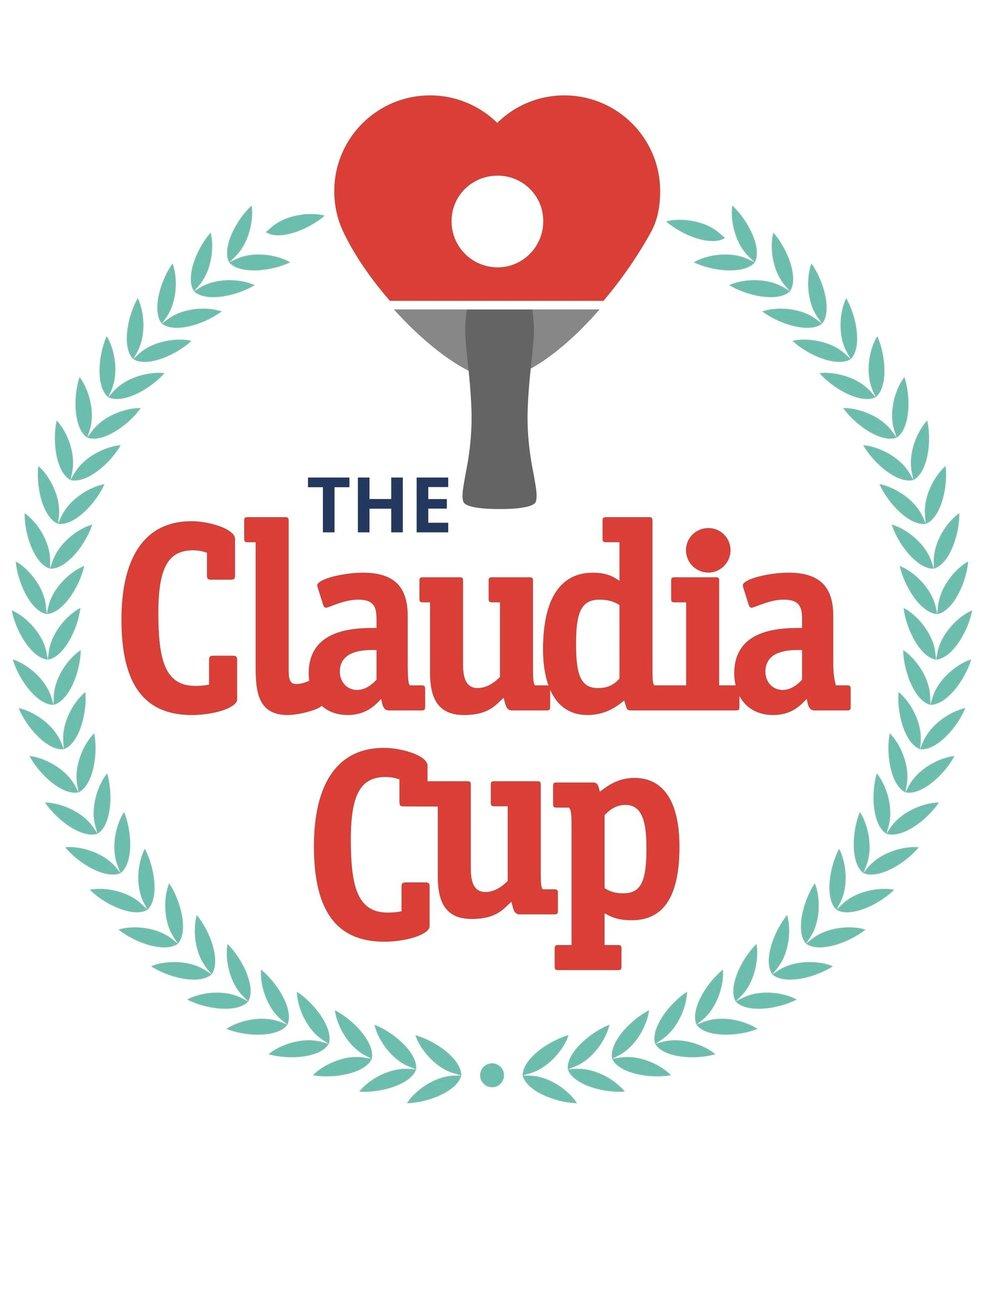 CLAUDIA-CUP-LOGO+GENERIC.jpg